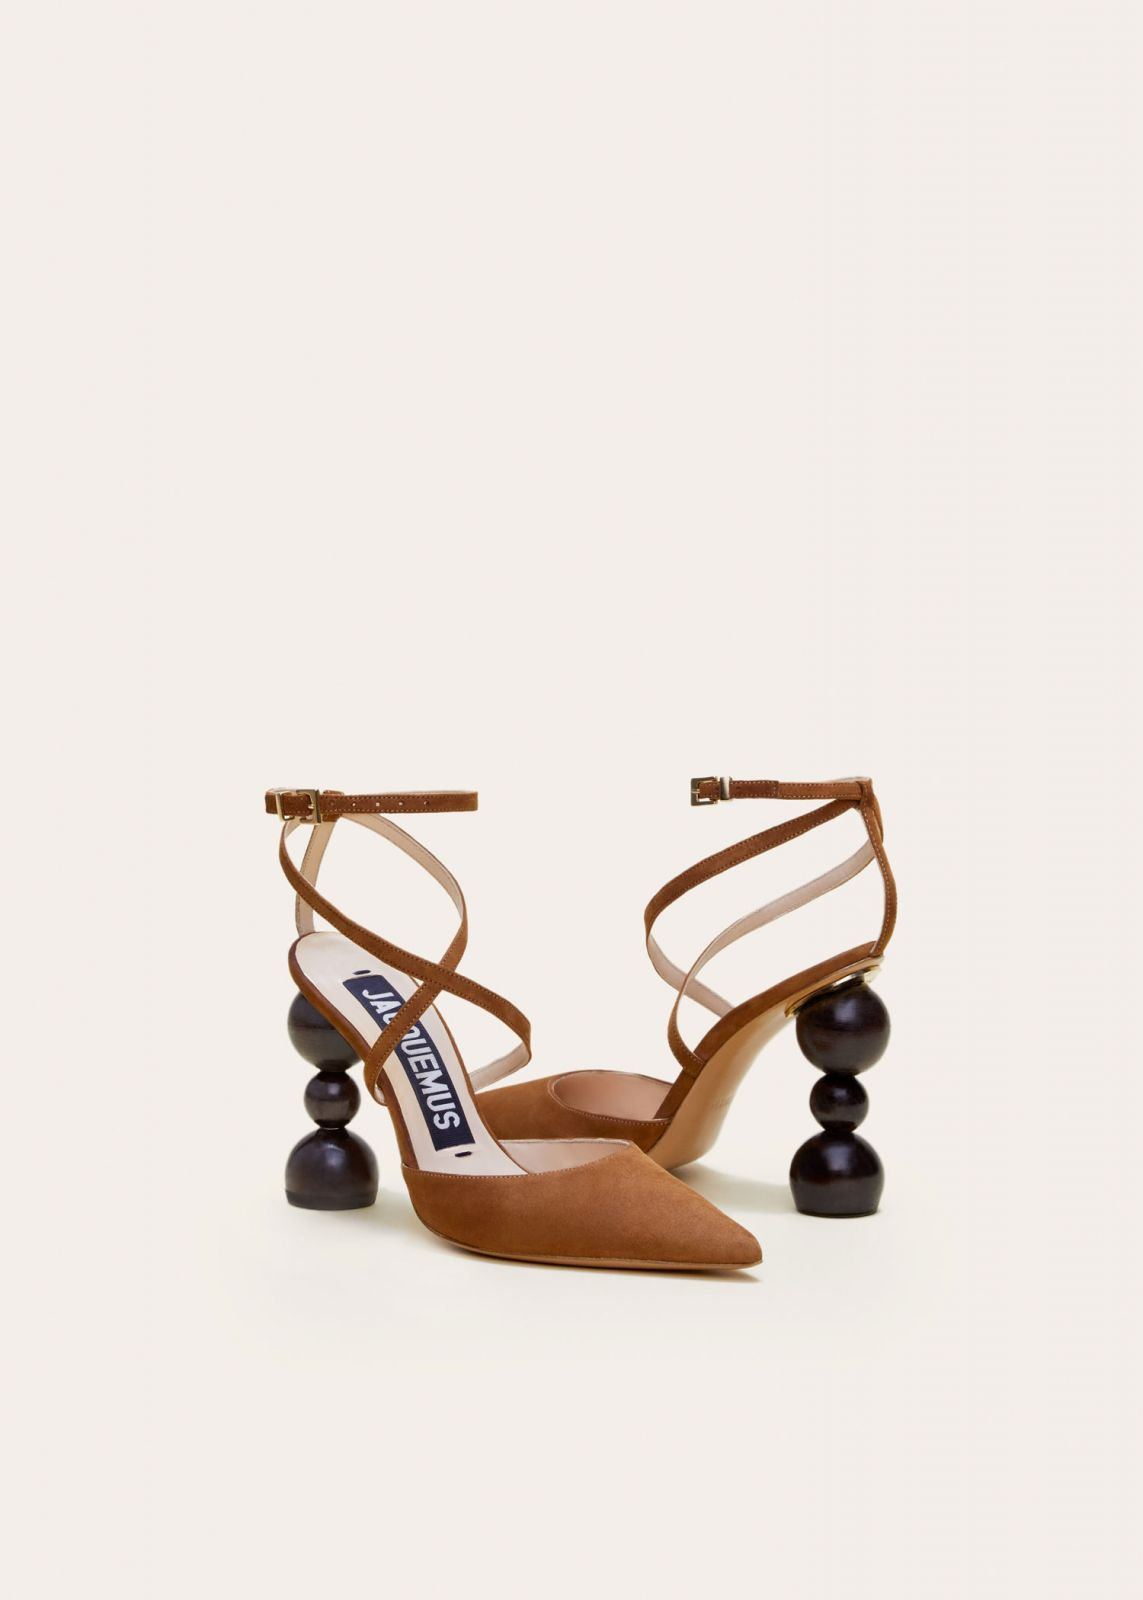 Fashion.Luxury | Designer shoes, Womens